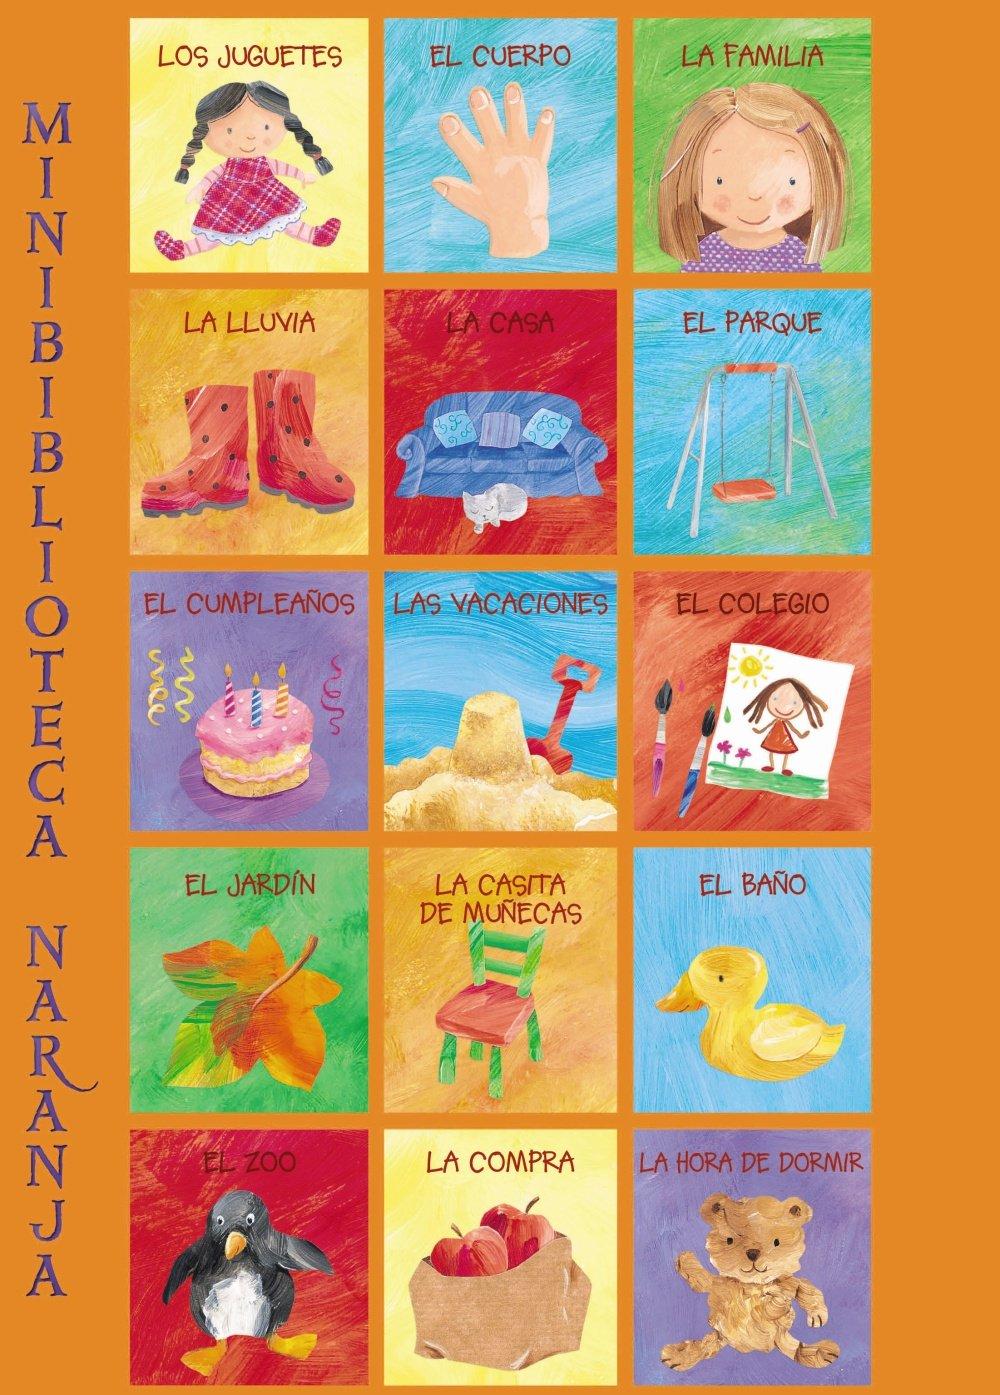 Minibiblioteca naranja / Orange Mini-library (Minibiblioteca / Mini Library) (Spanish Edition) pdf epub